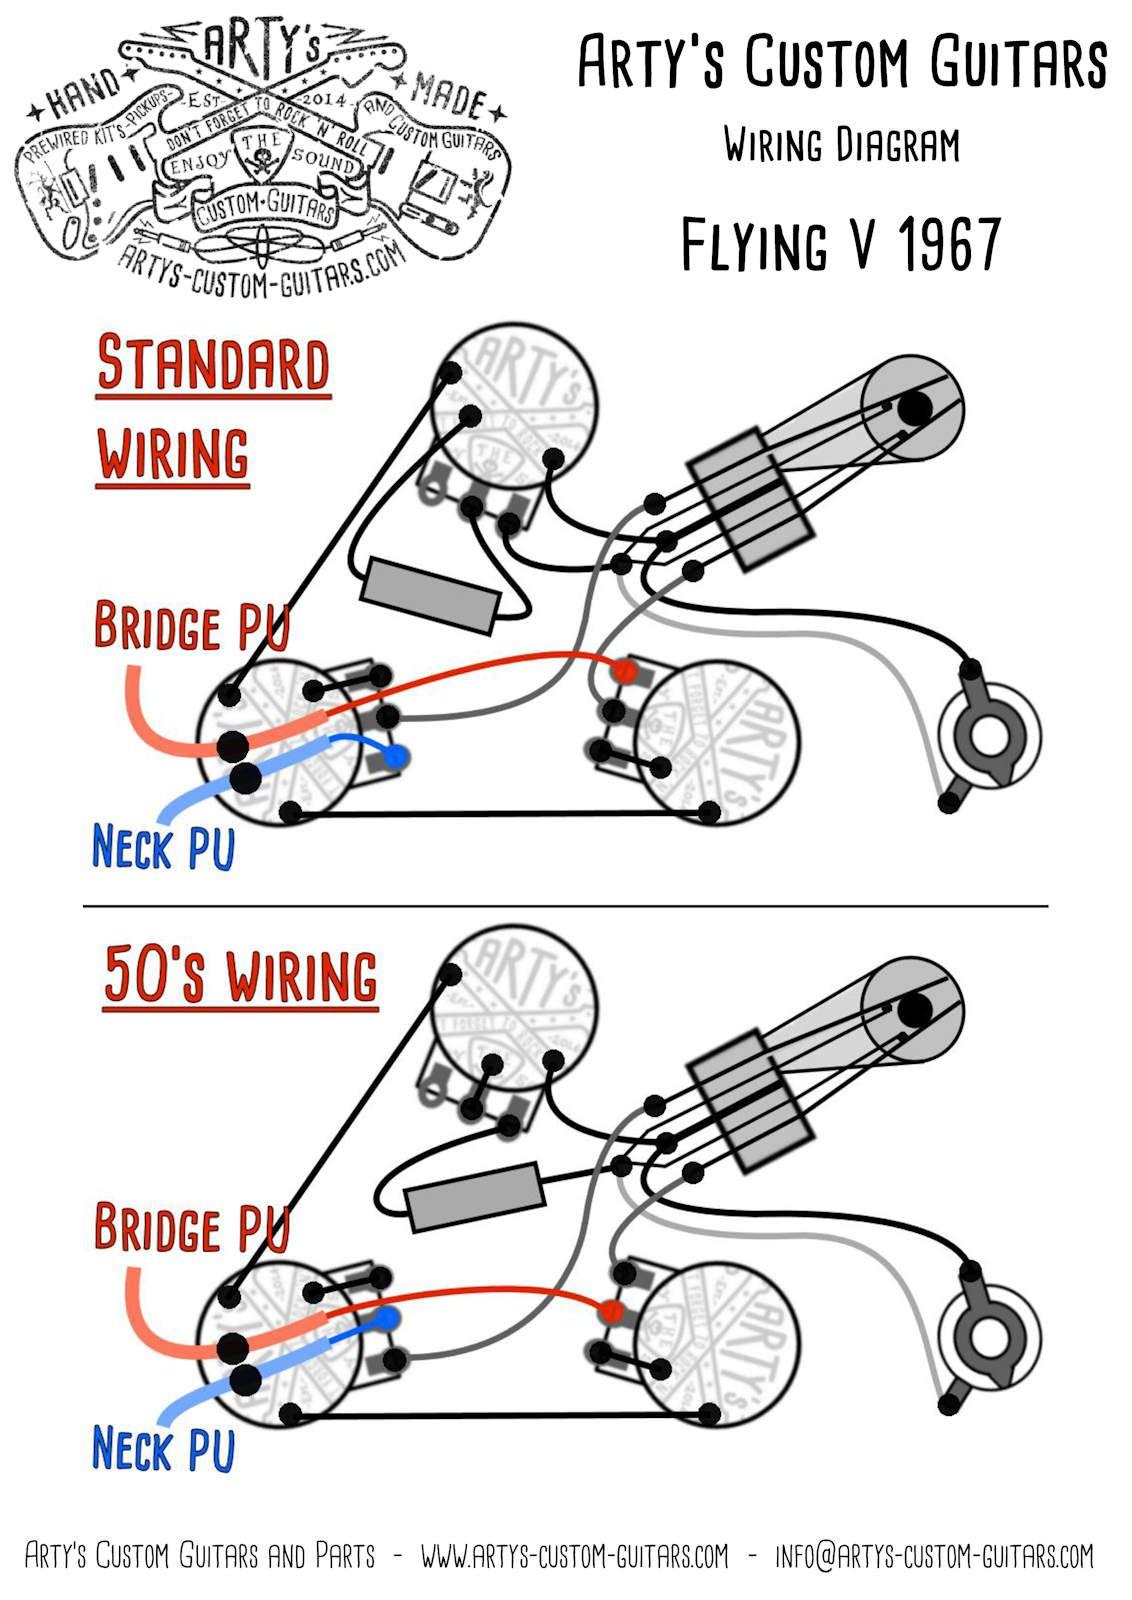 hight resolution of jackson flying v wiring wiring diagram datasourceflying v wiring diagram wiring diagram toolbox jackson flying v